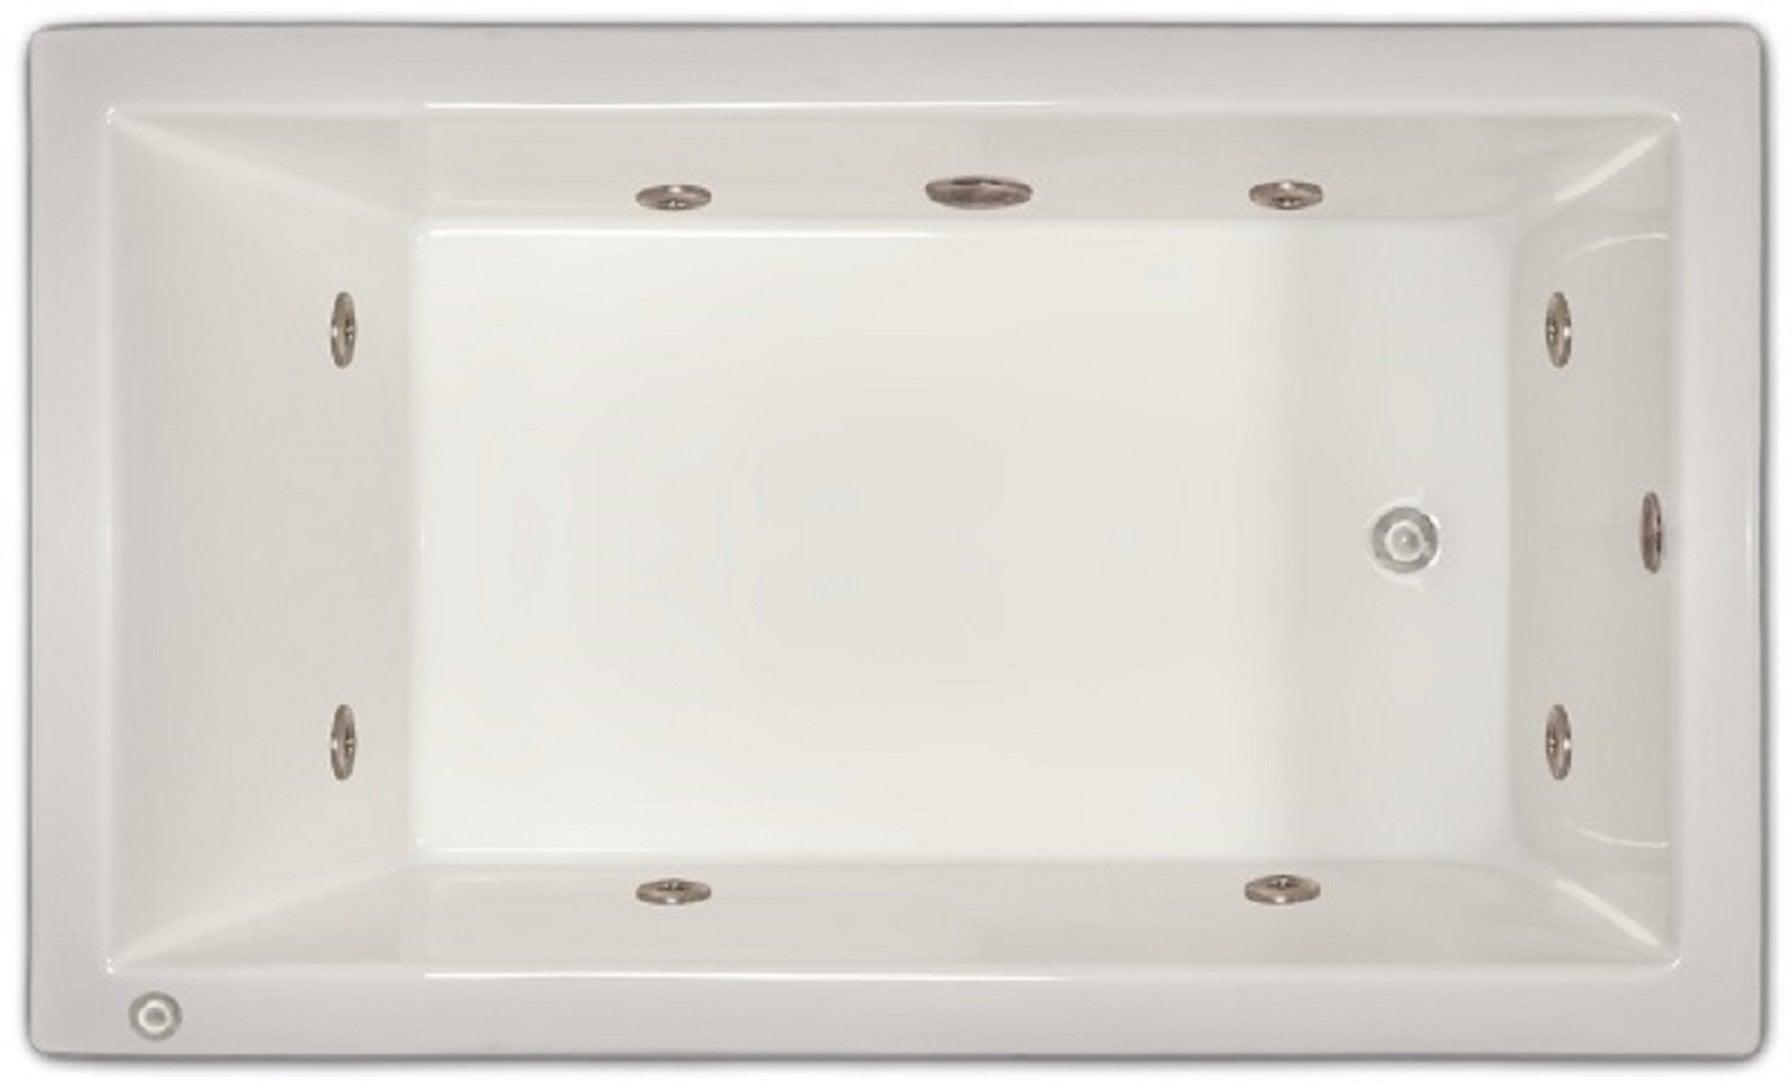 Drop-in Bathtub / 59.5x35.5x19 / high gloss white acrylic / Rectangle / LPI18-W-LD Pinnacle Bath - Whirlpool 0